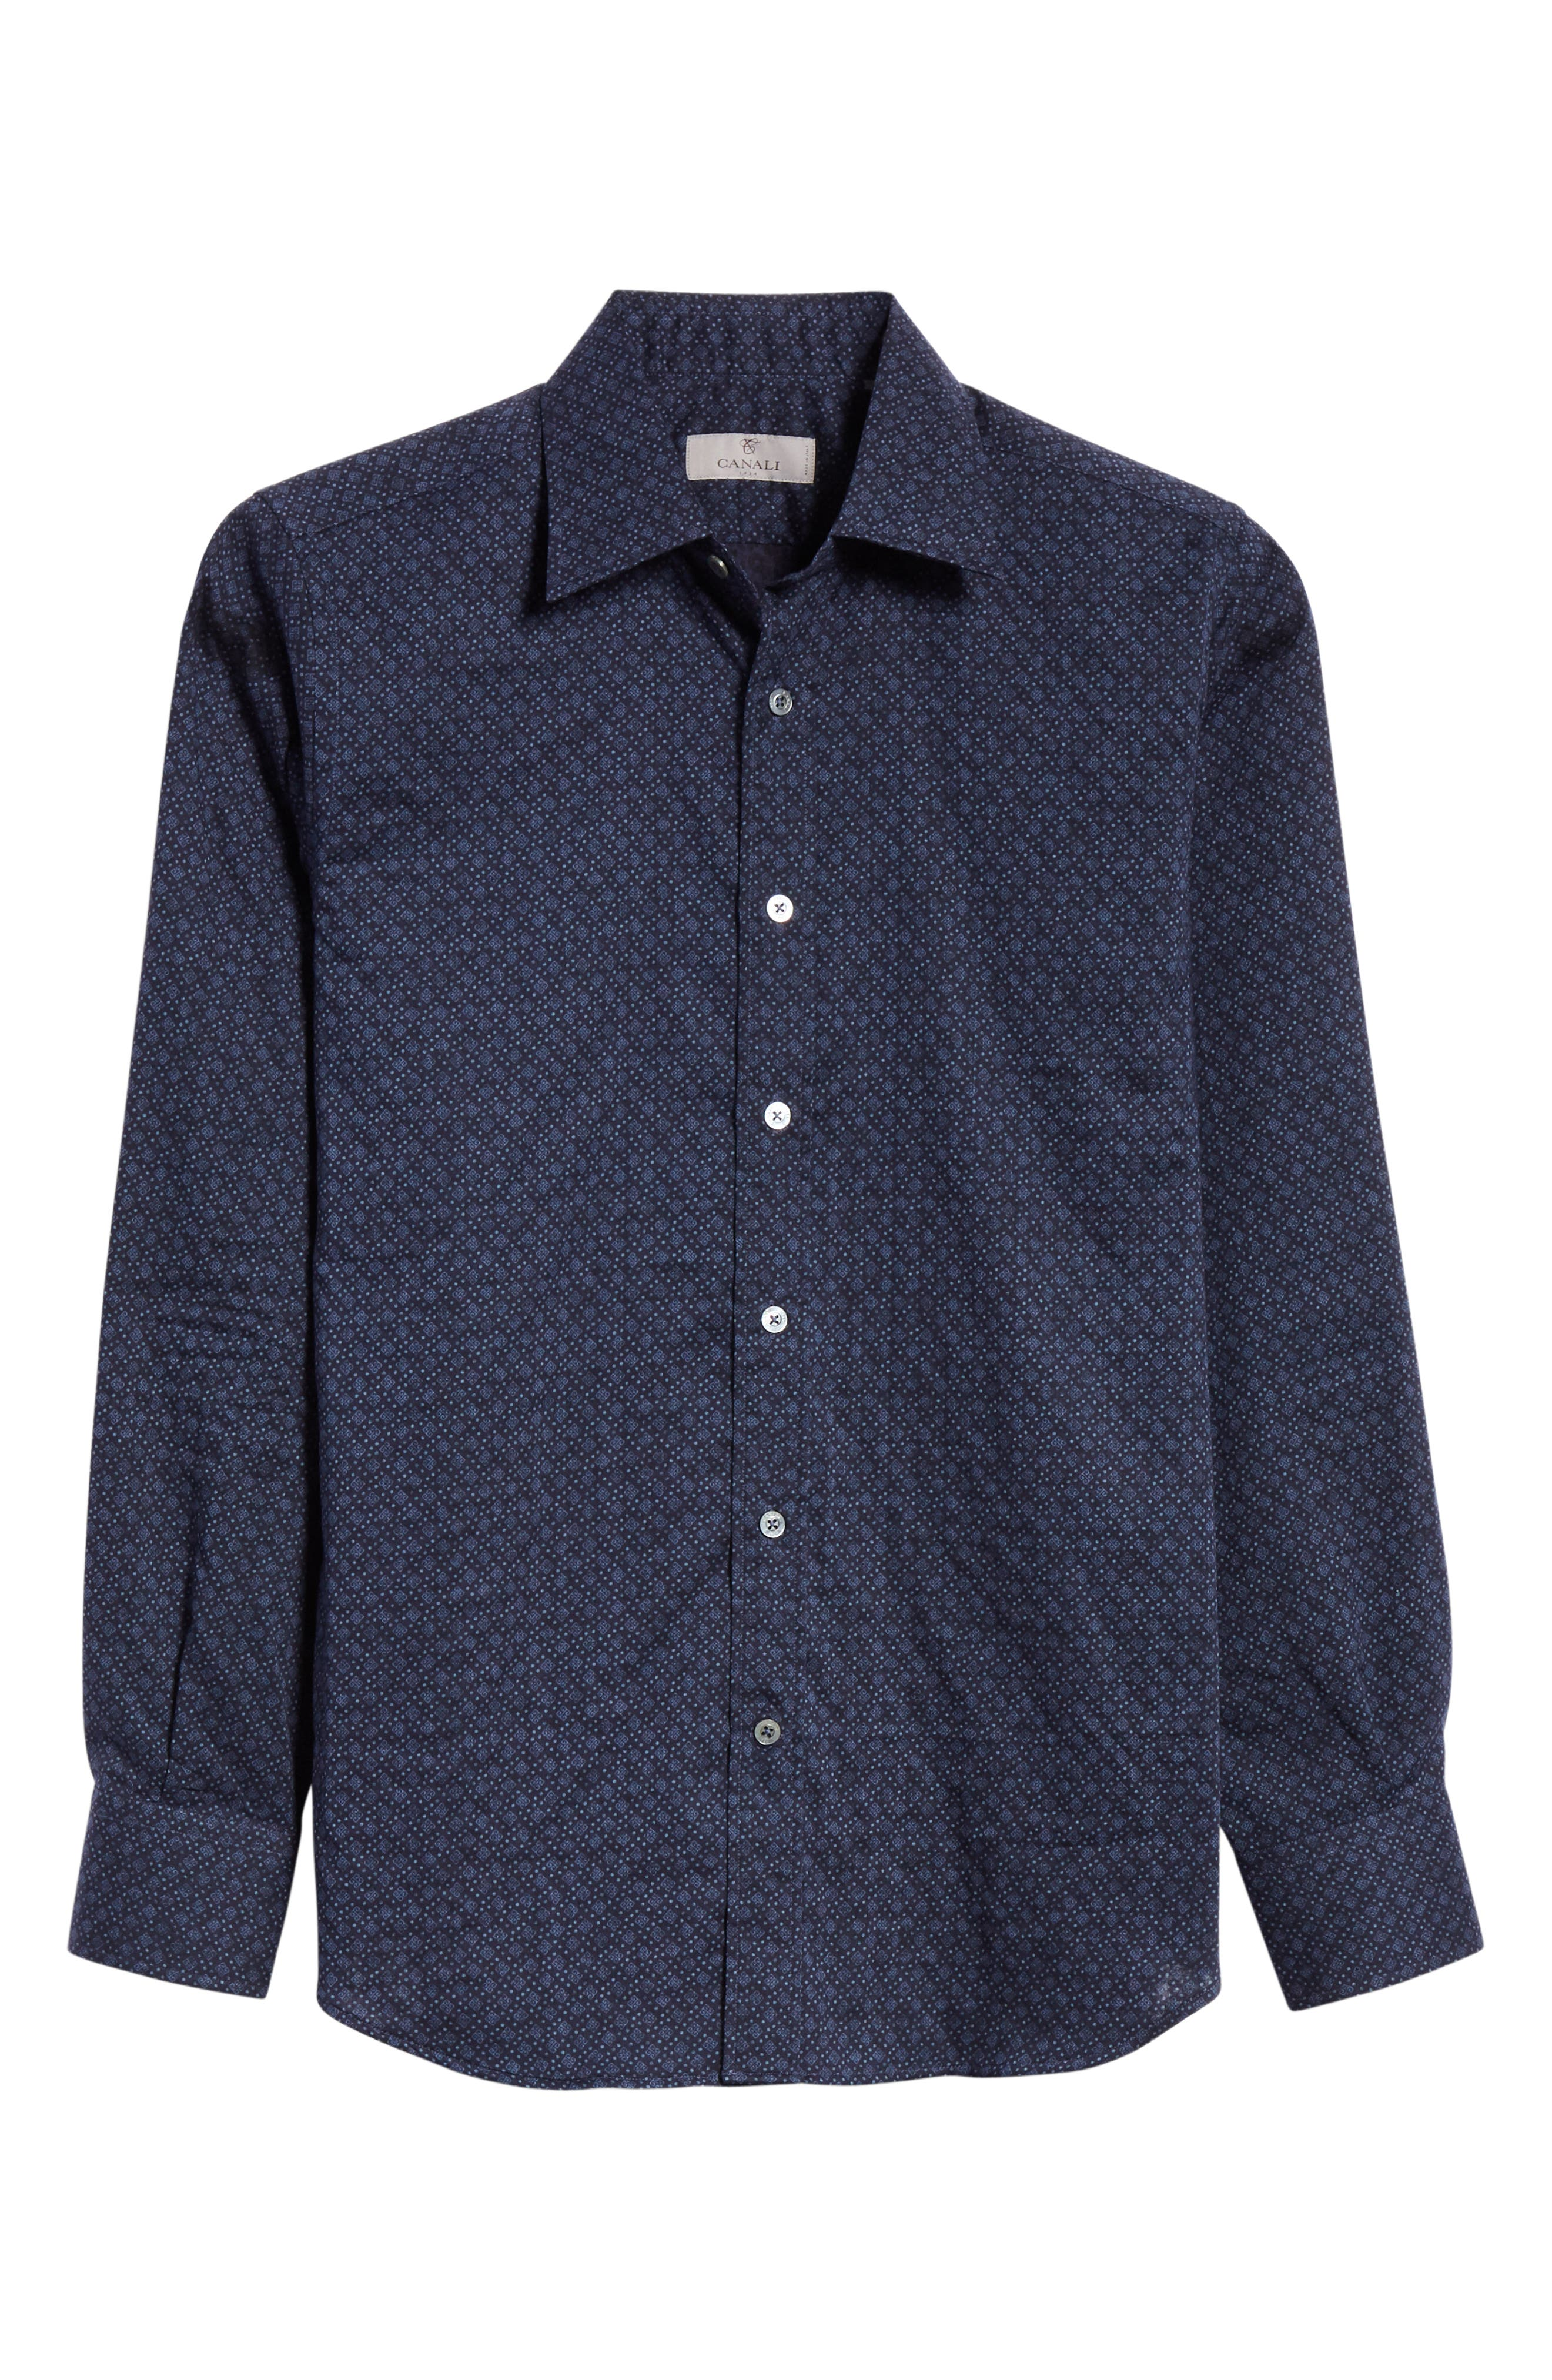 Regular Fit Easy Care Geometric Sport Shirt,                             Alternate thumbnail 6, color,                             NAVY